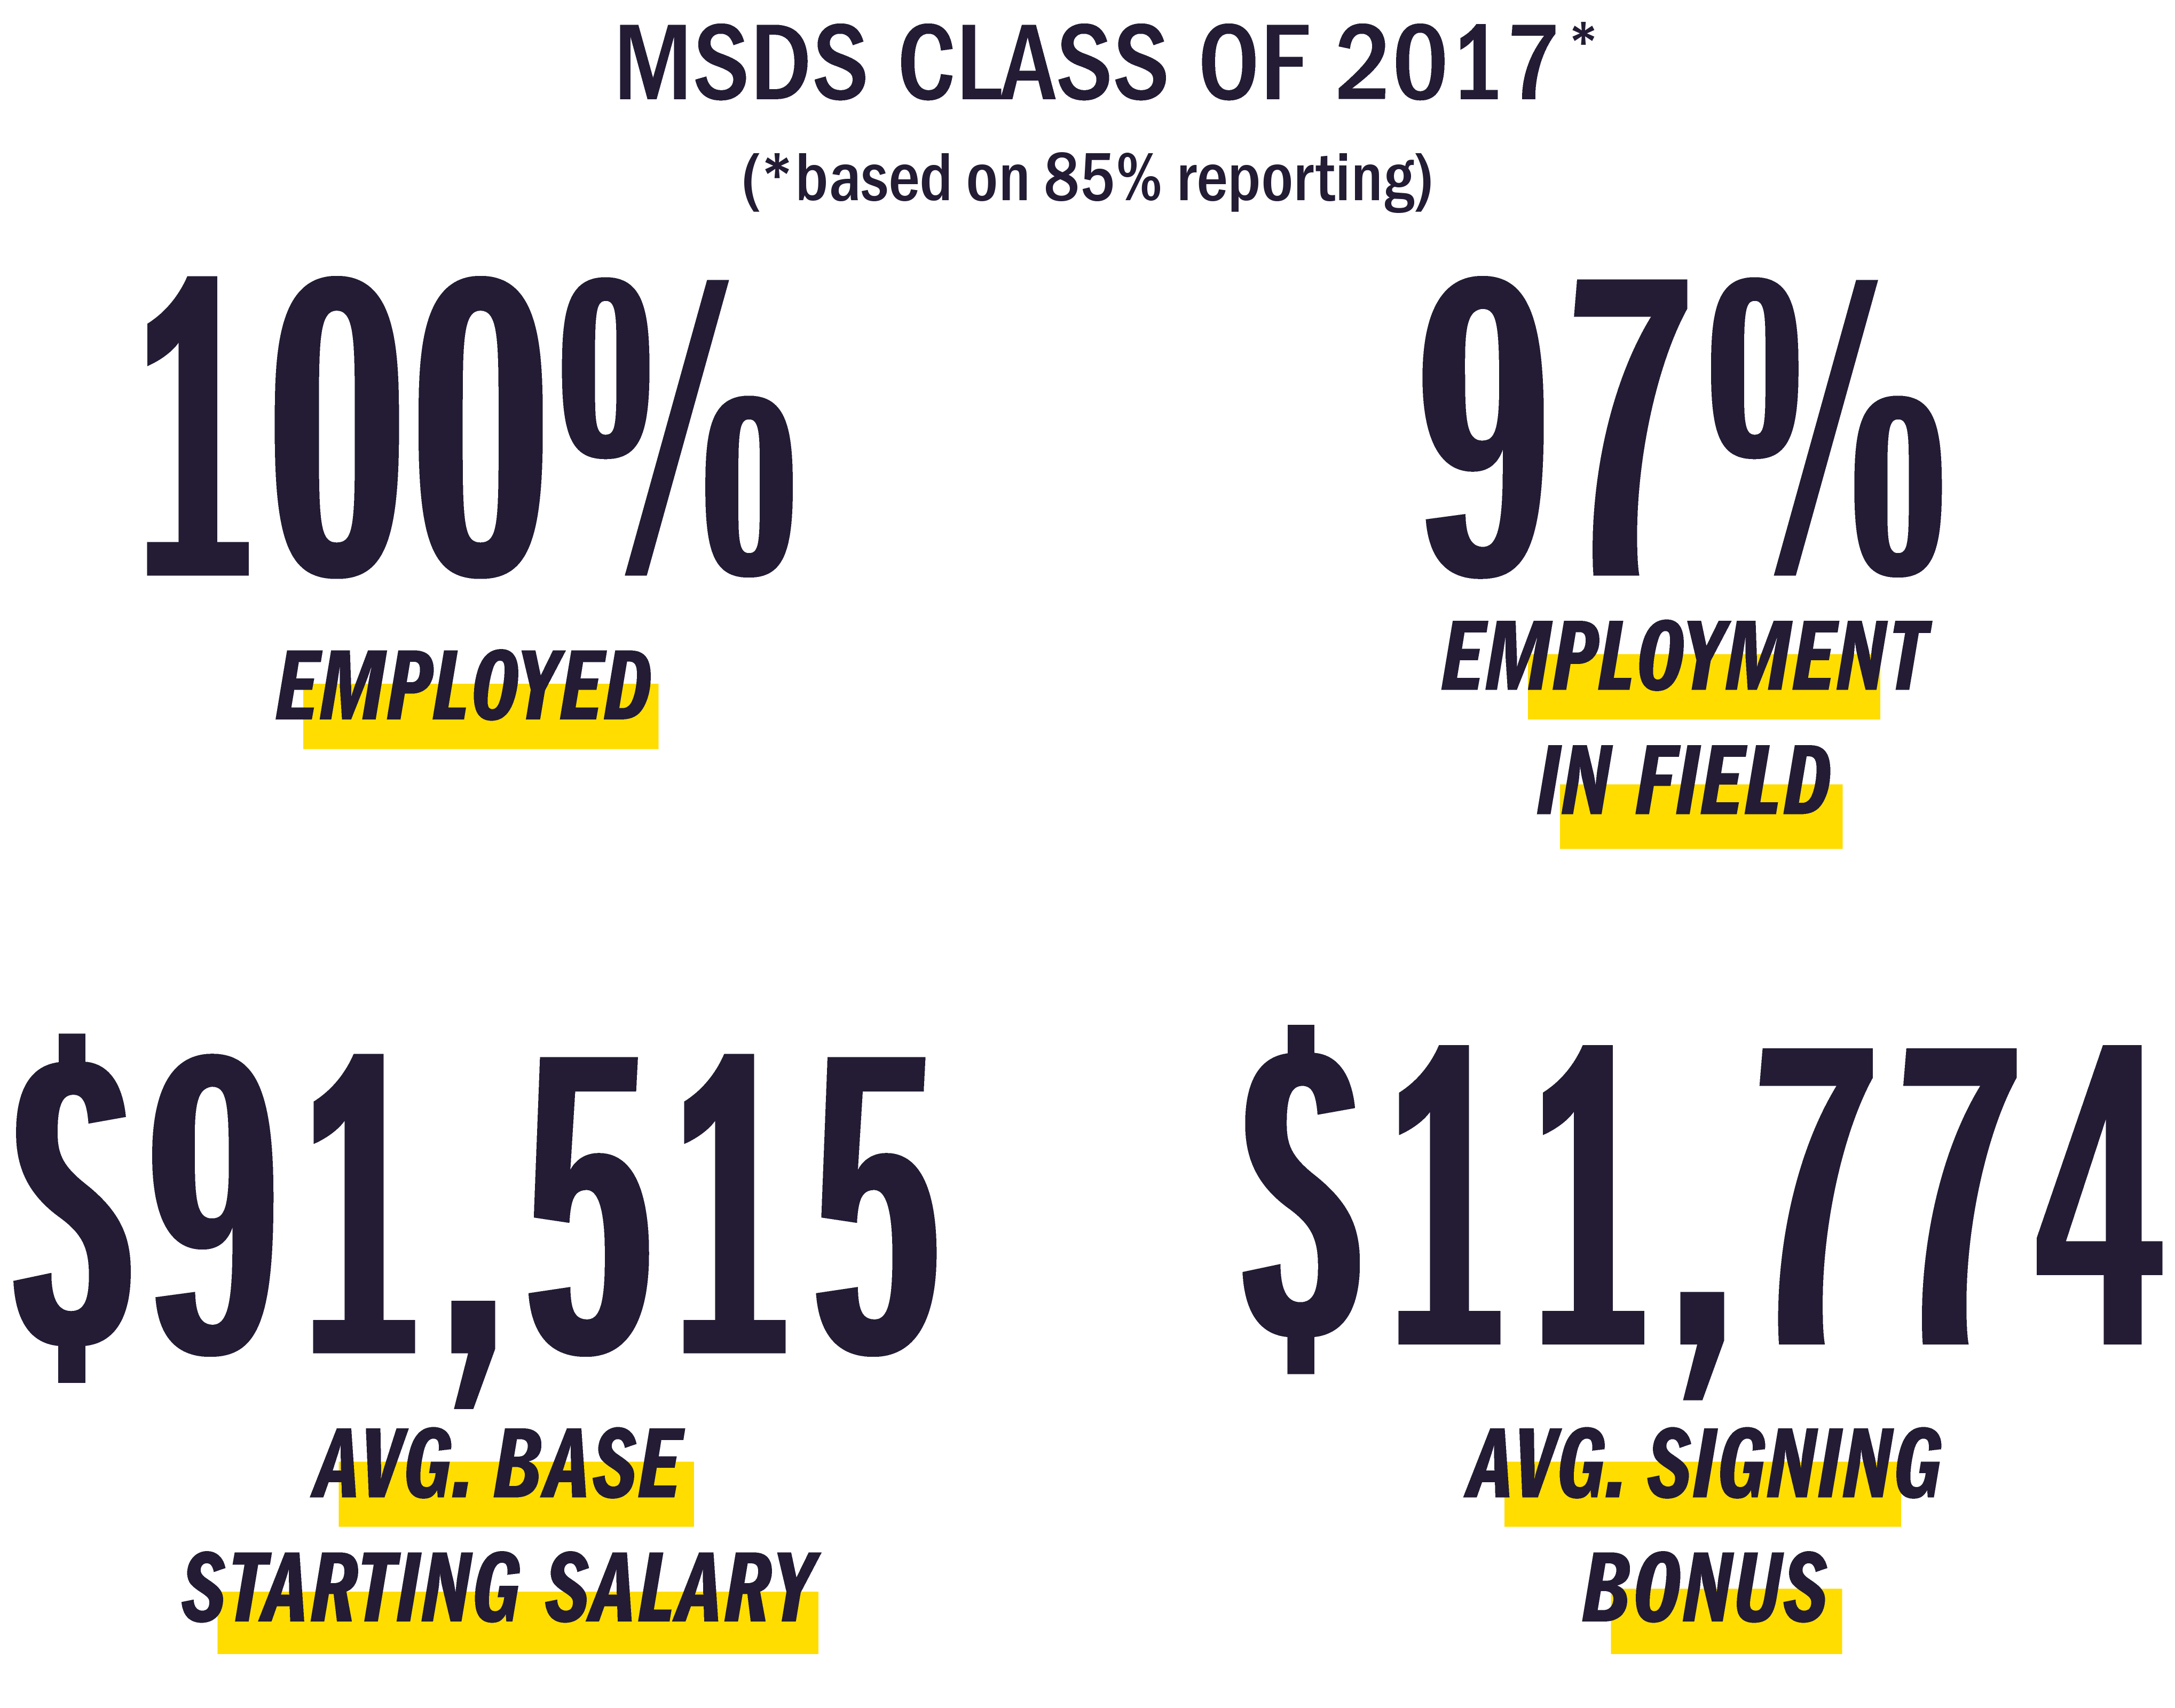 2017 Placement Statistics